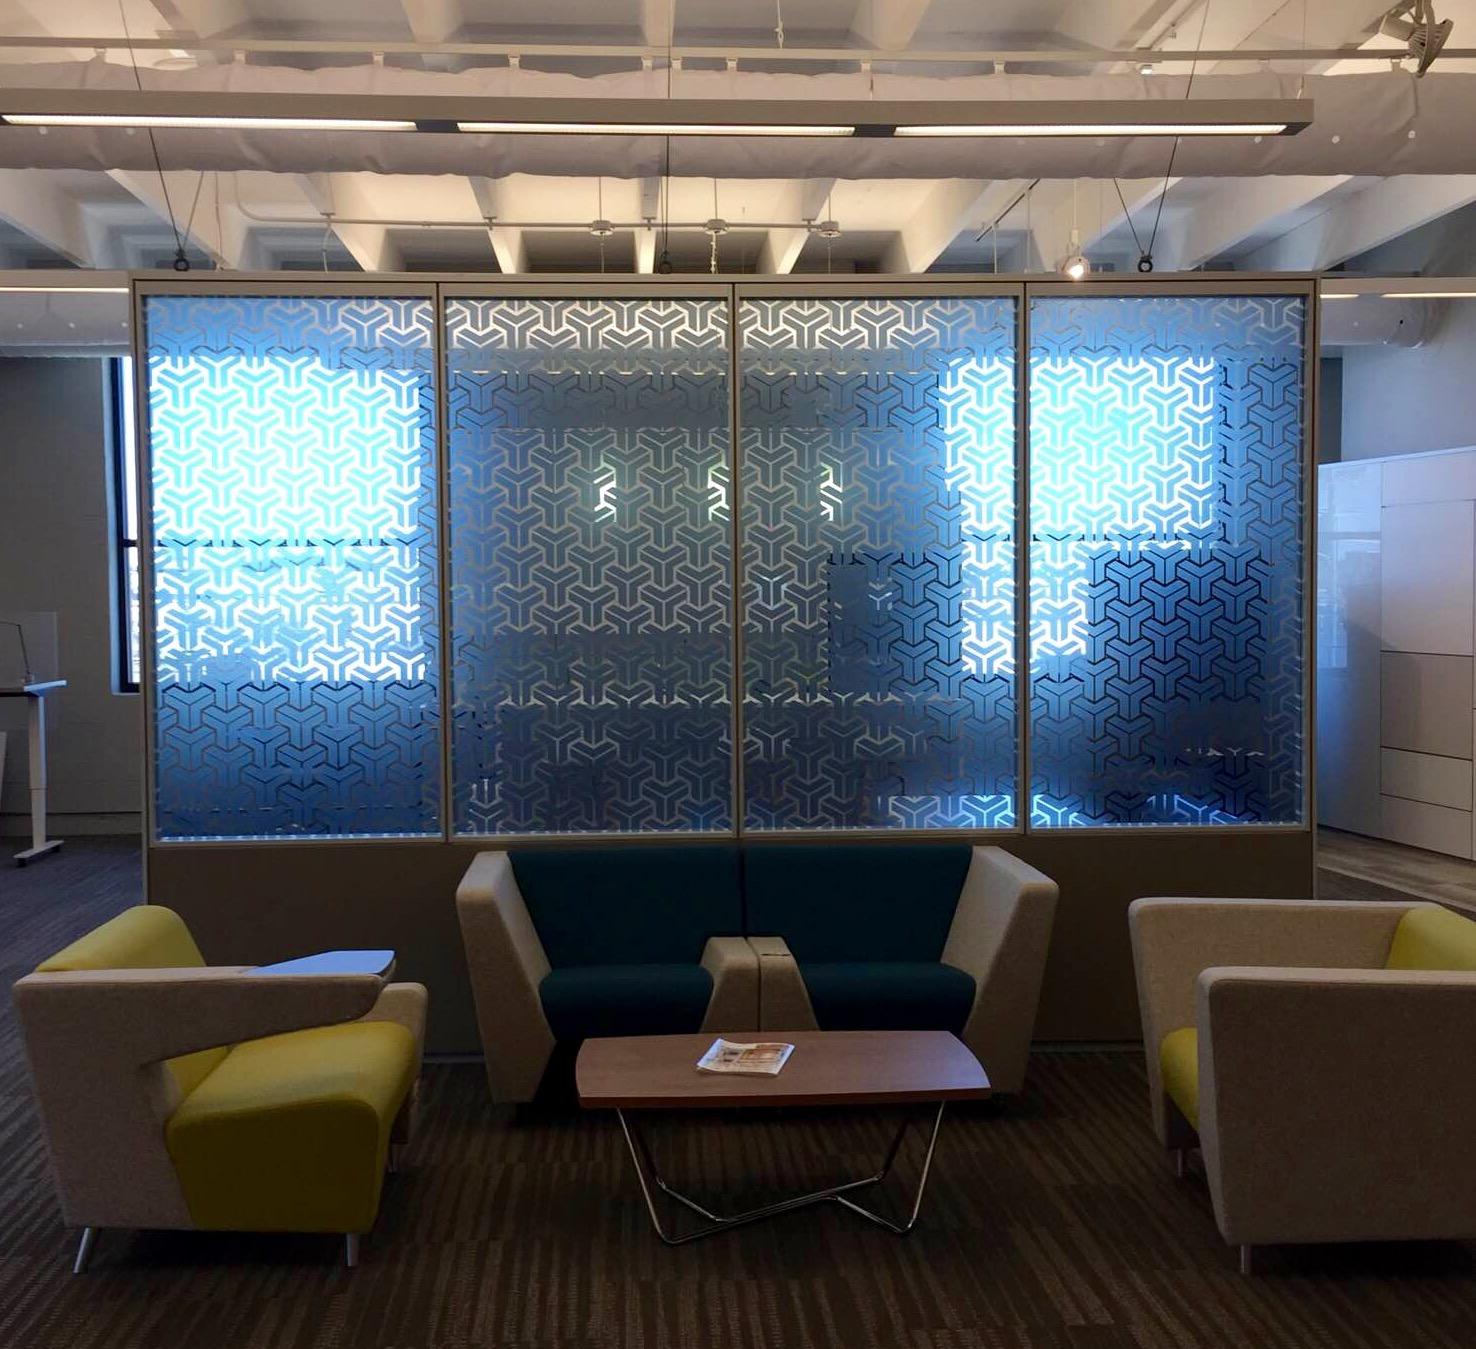 Custom Printed Decorative Glass Film Adds Attractive Privacy